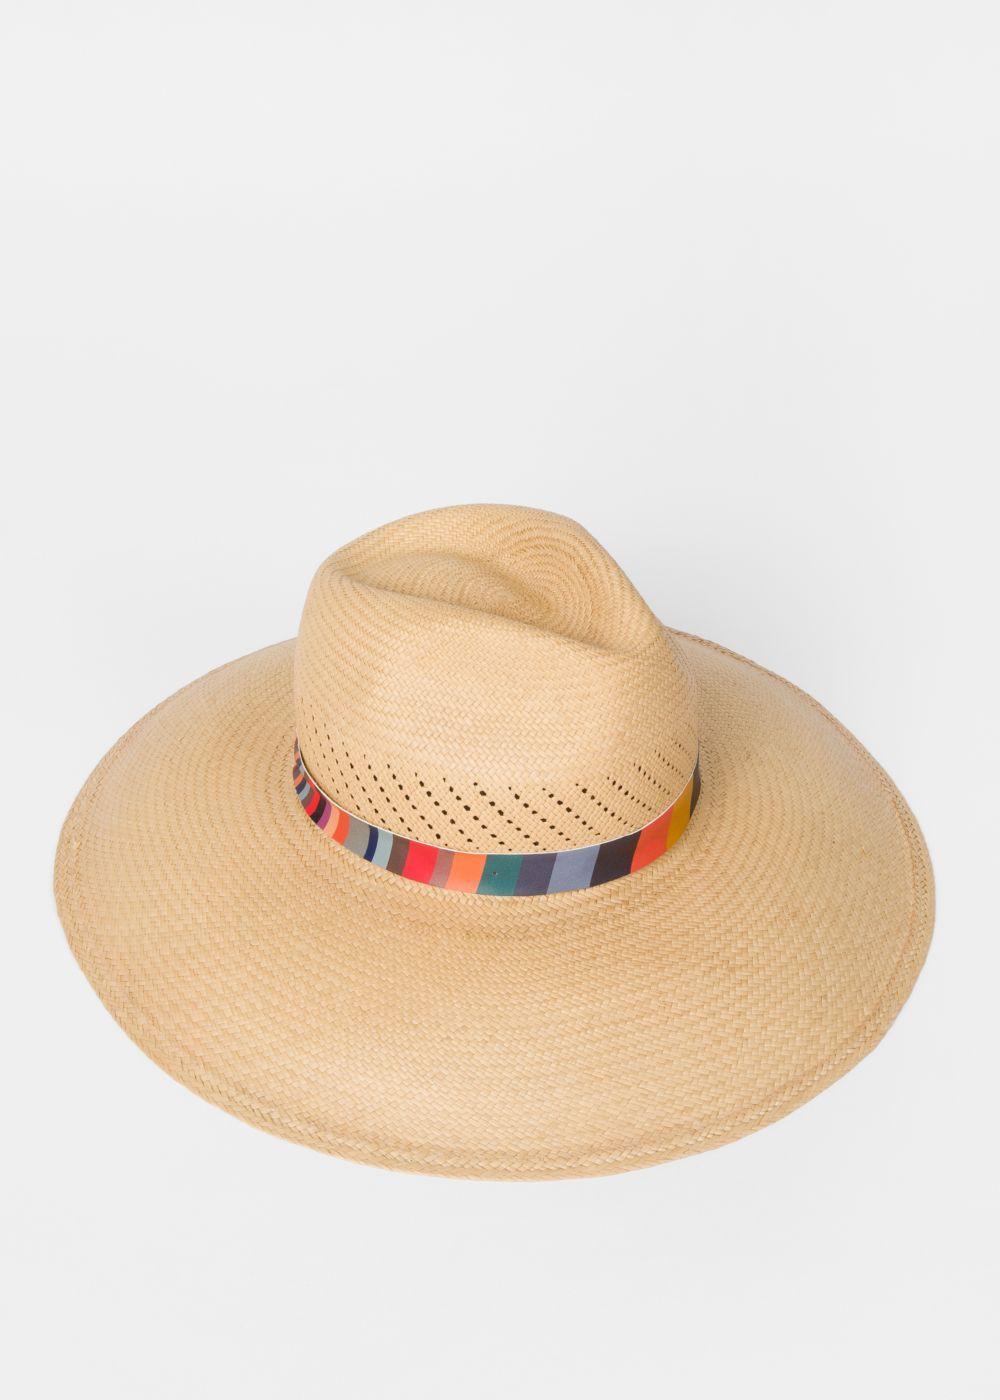 3796819d Women's 'Swirl' Band Woven Panama Hat in 2019 | Hats | Hats, Panama ...